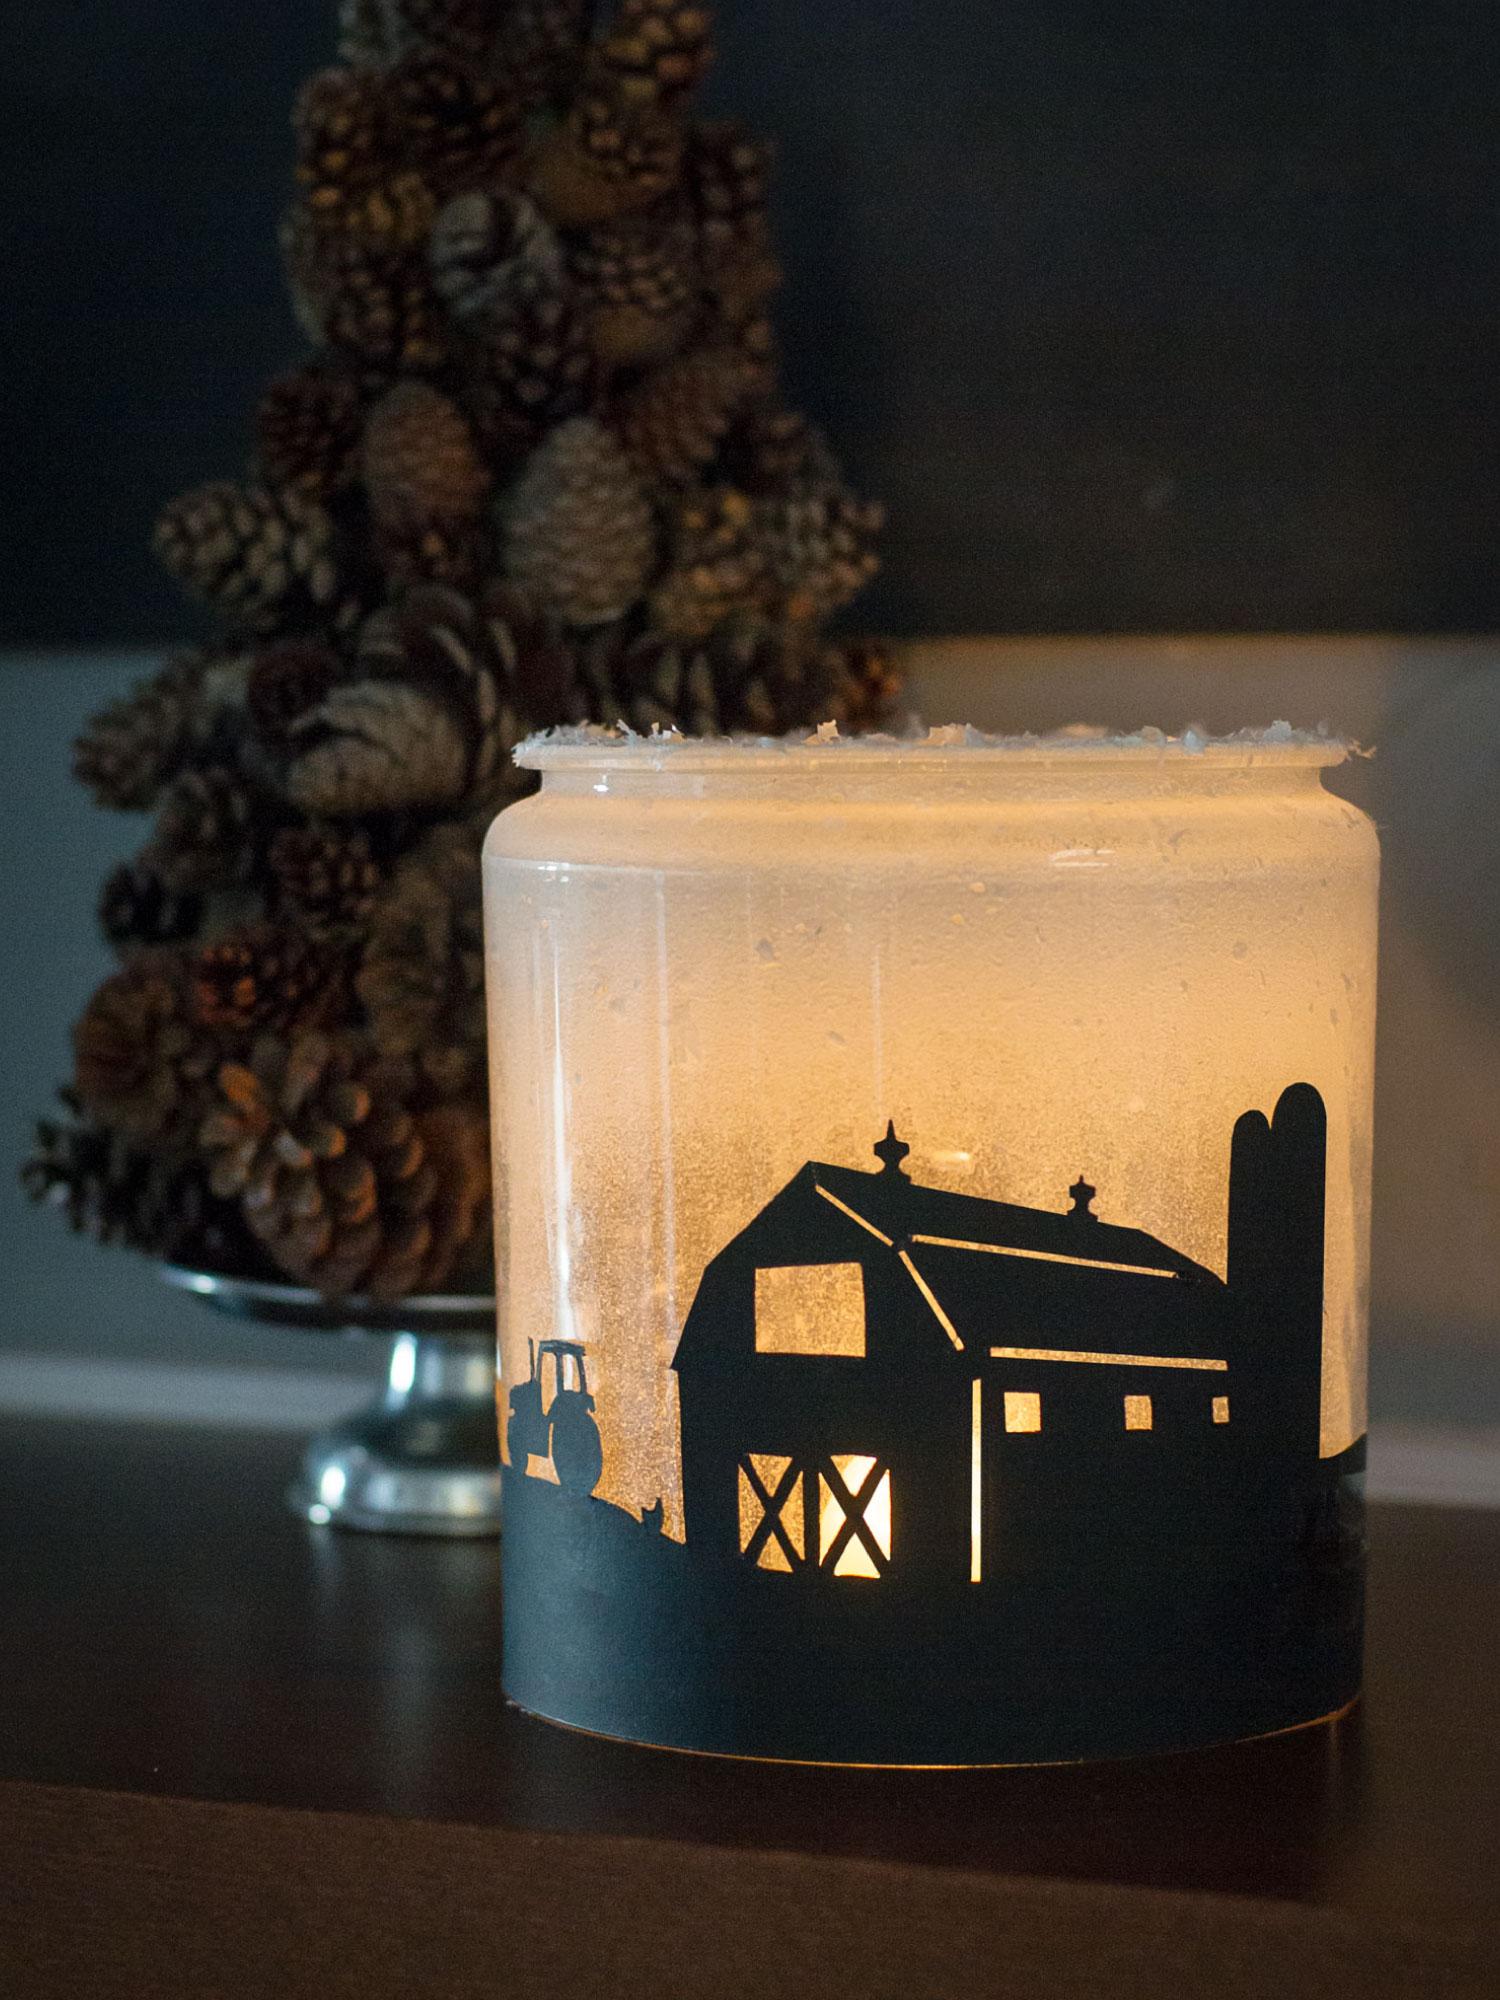 Winter Luminary Jar by Sam Henderson of Today's Nest for HGTVGardens.